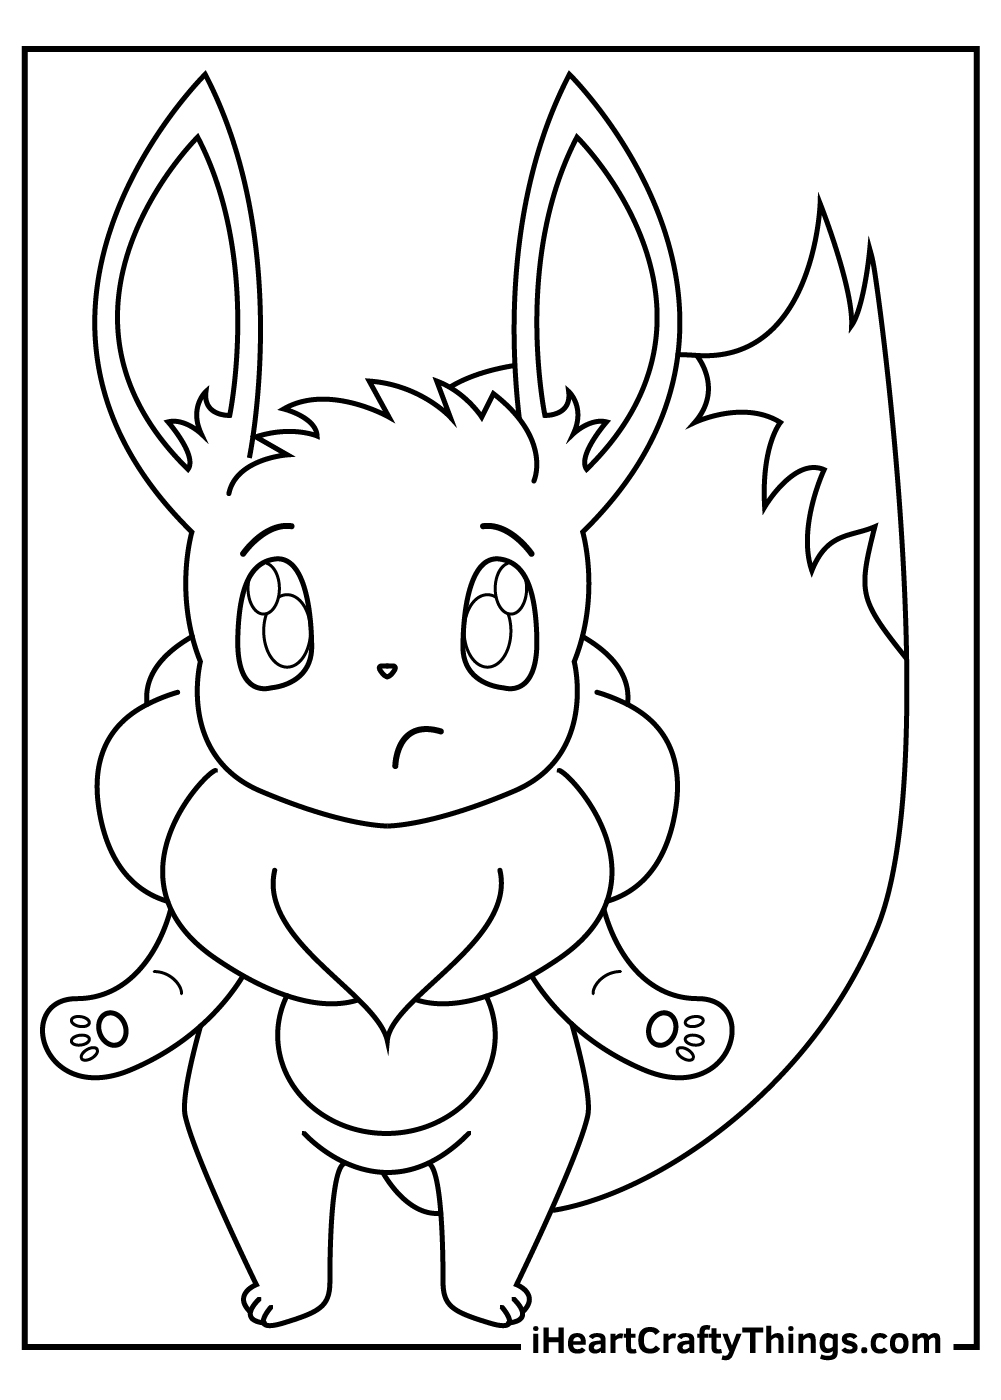 cute eevee pokemon coloring pages for preschoolers